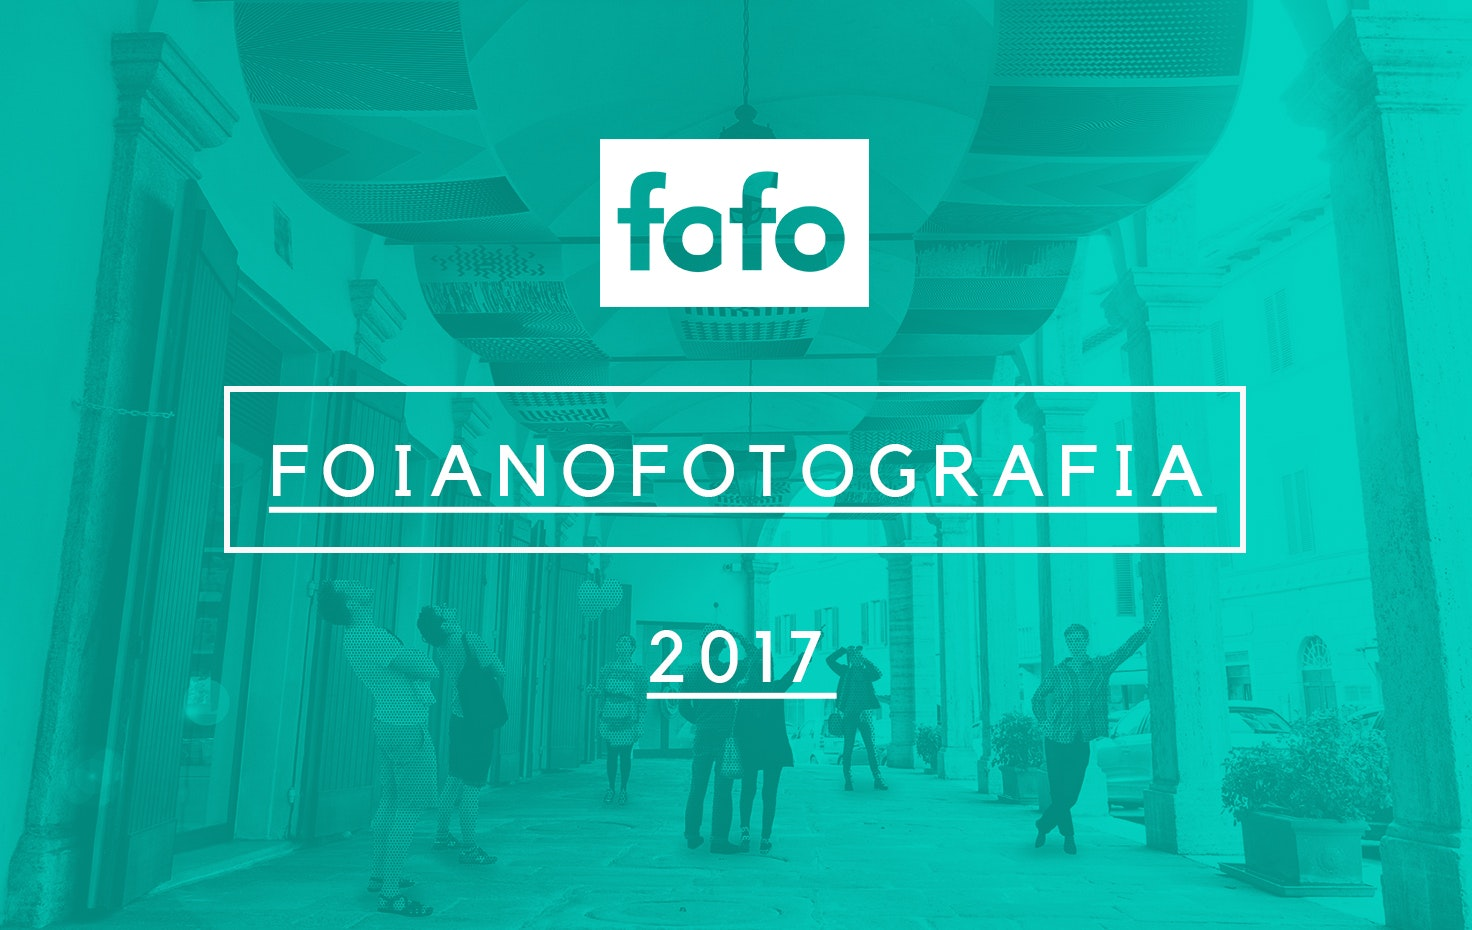 FOIANOFOTOGRAFIA 2017